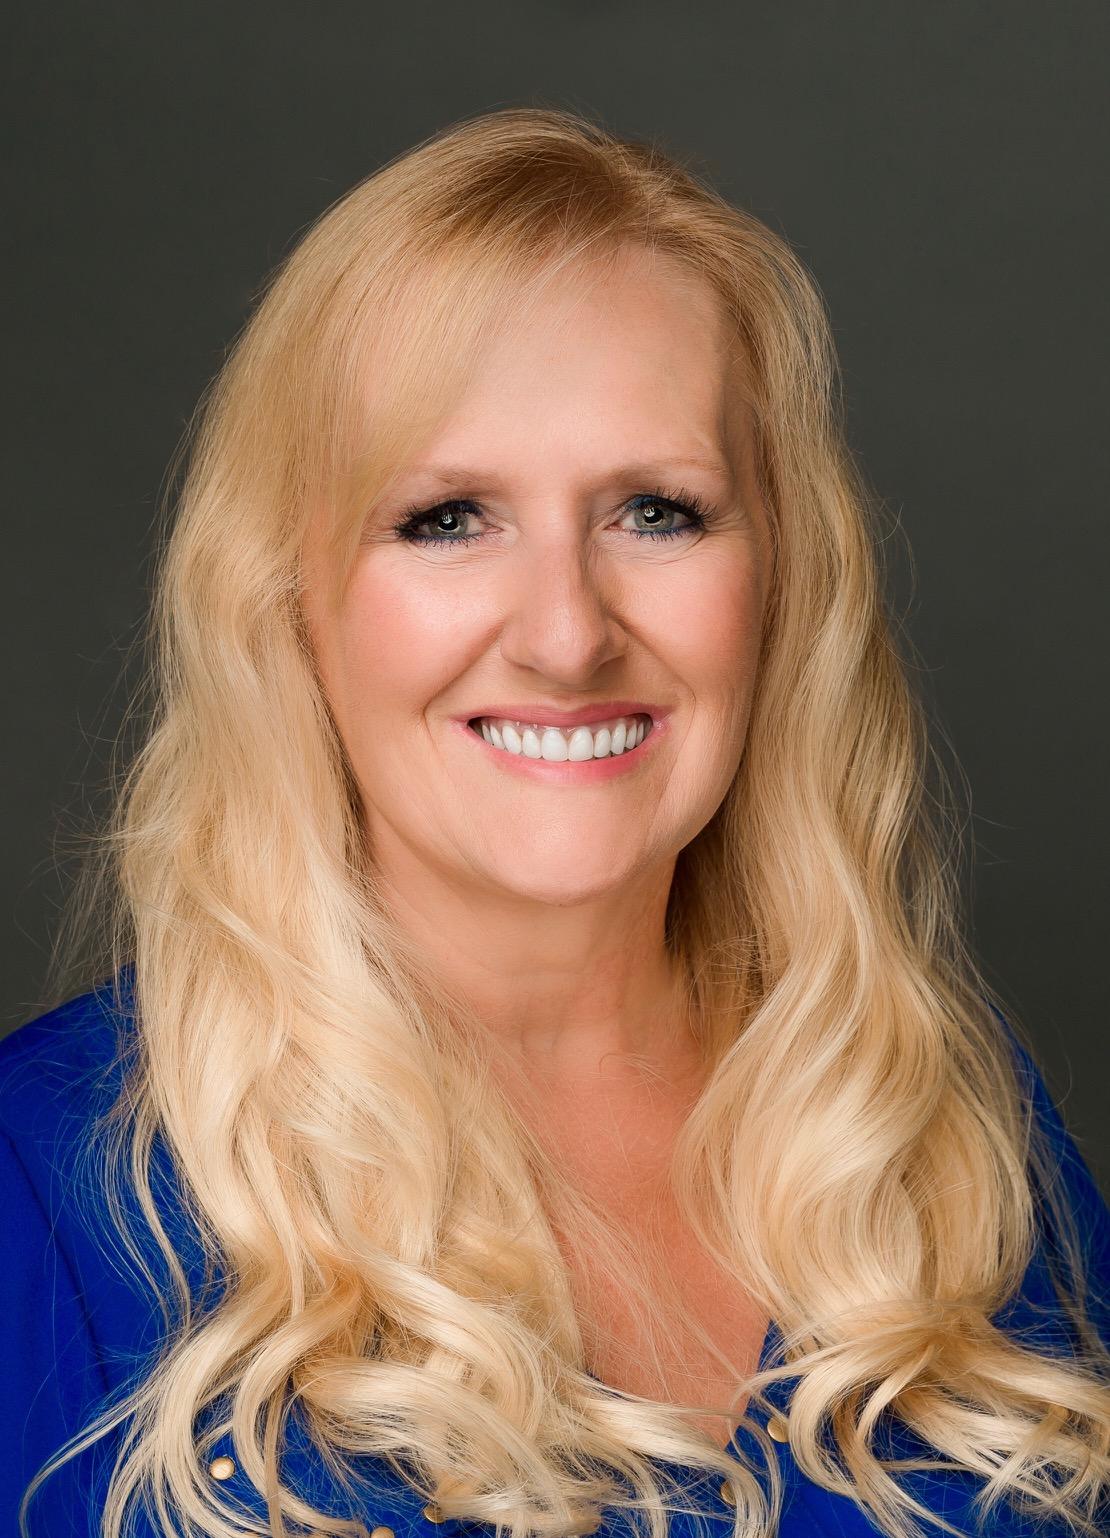 Kelly E. Professional Head shot 2019